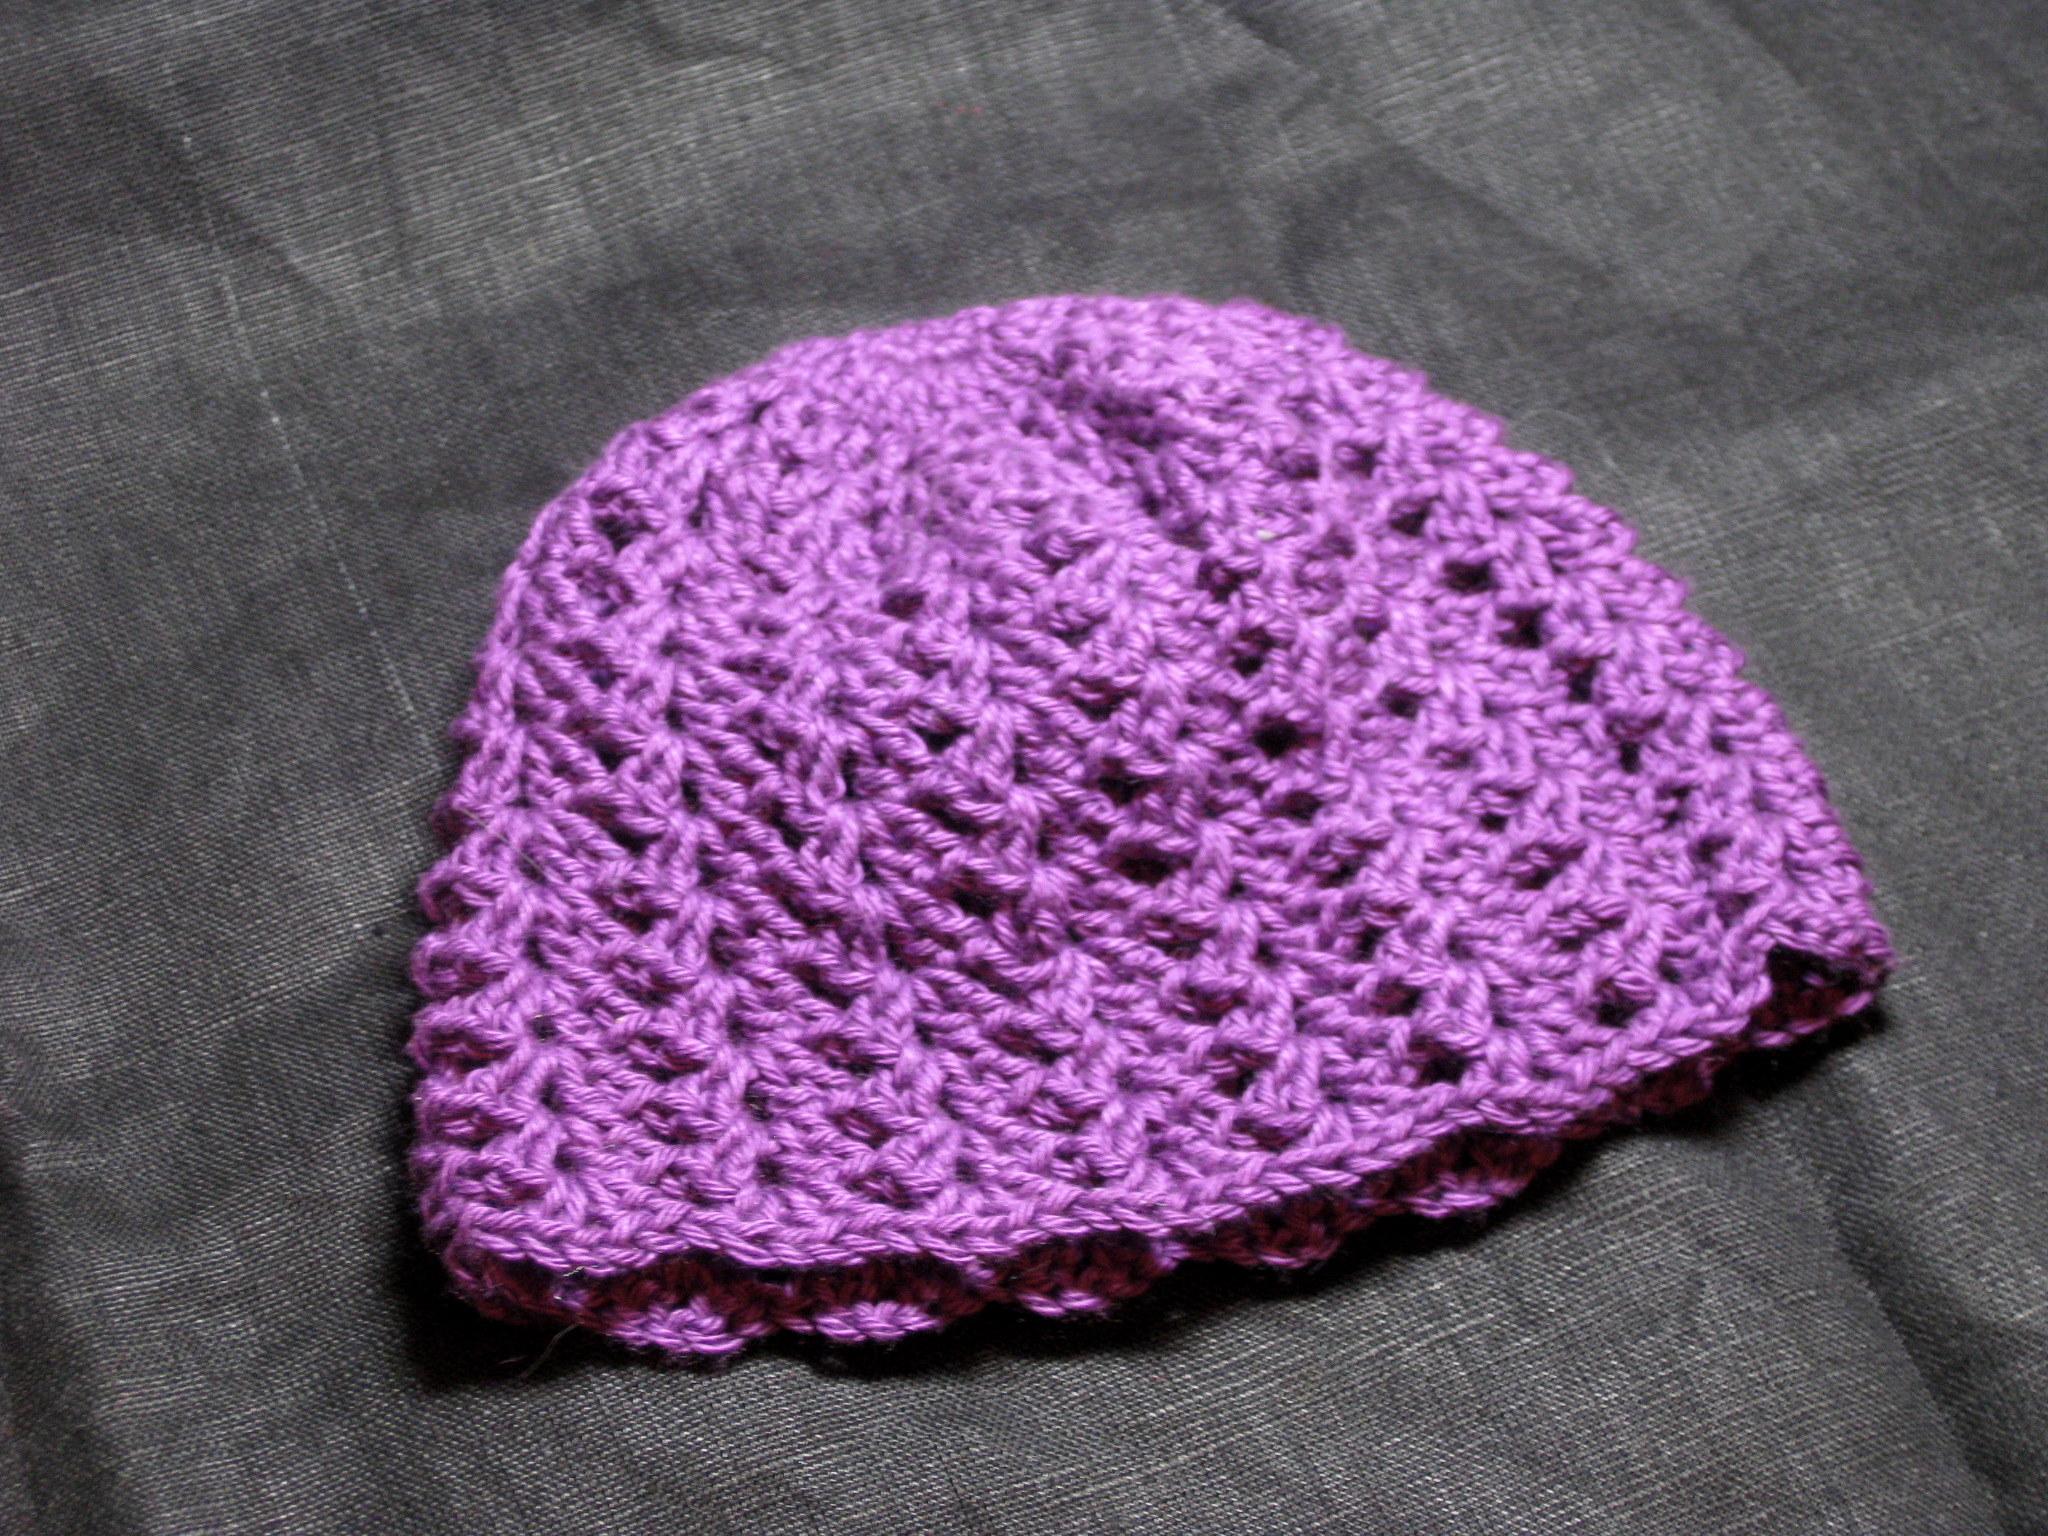 Hamburke S Crochet Crochet Baby Beanie Lacy Shell